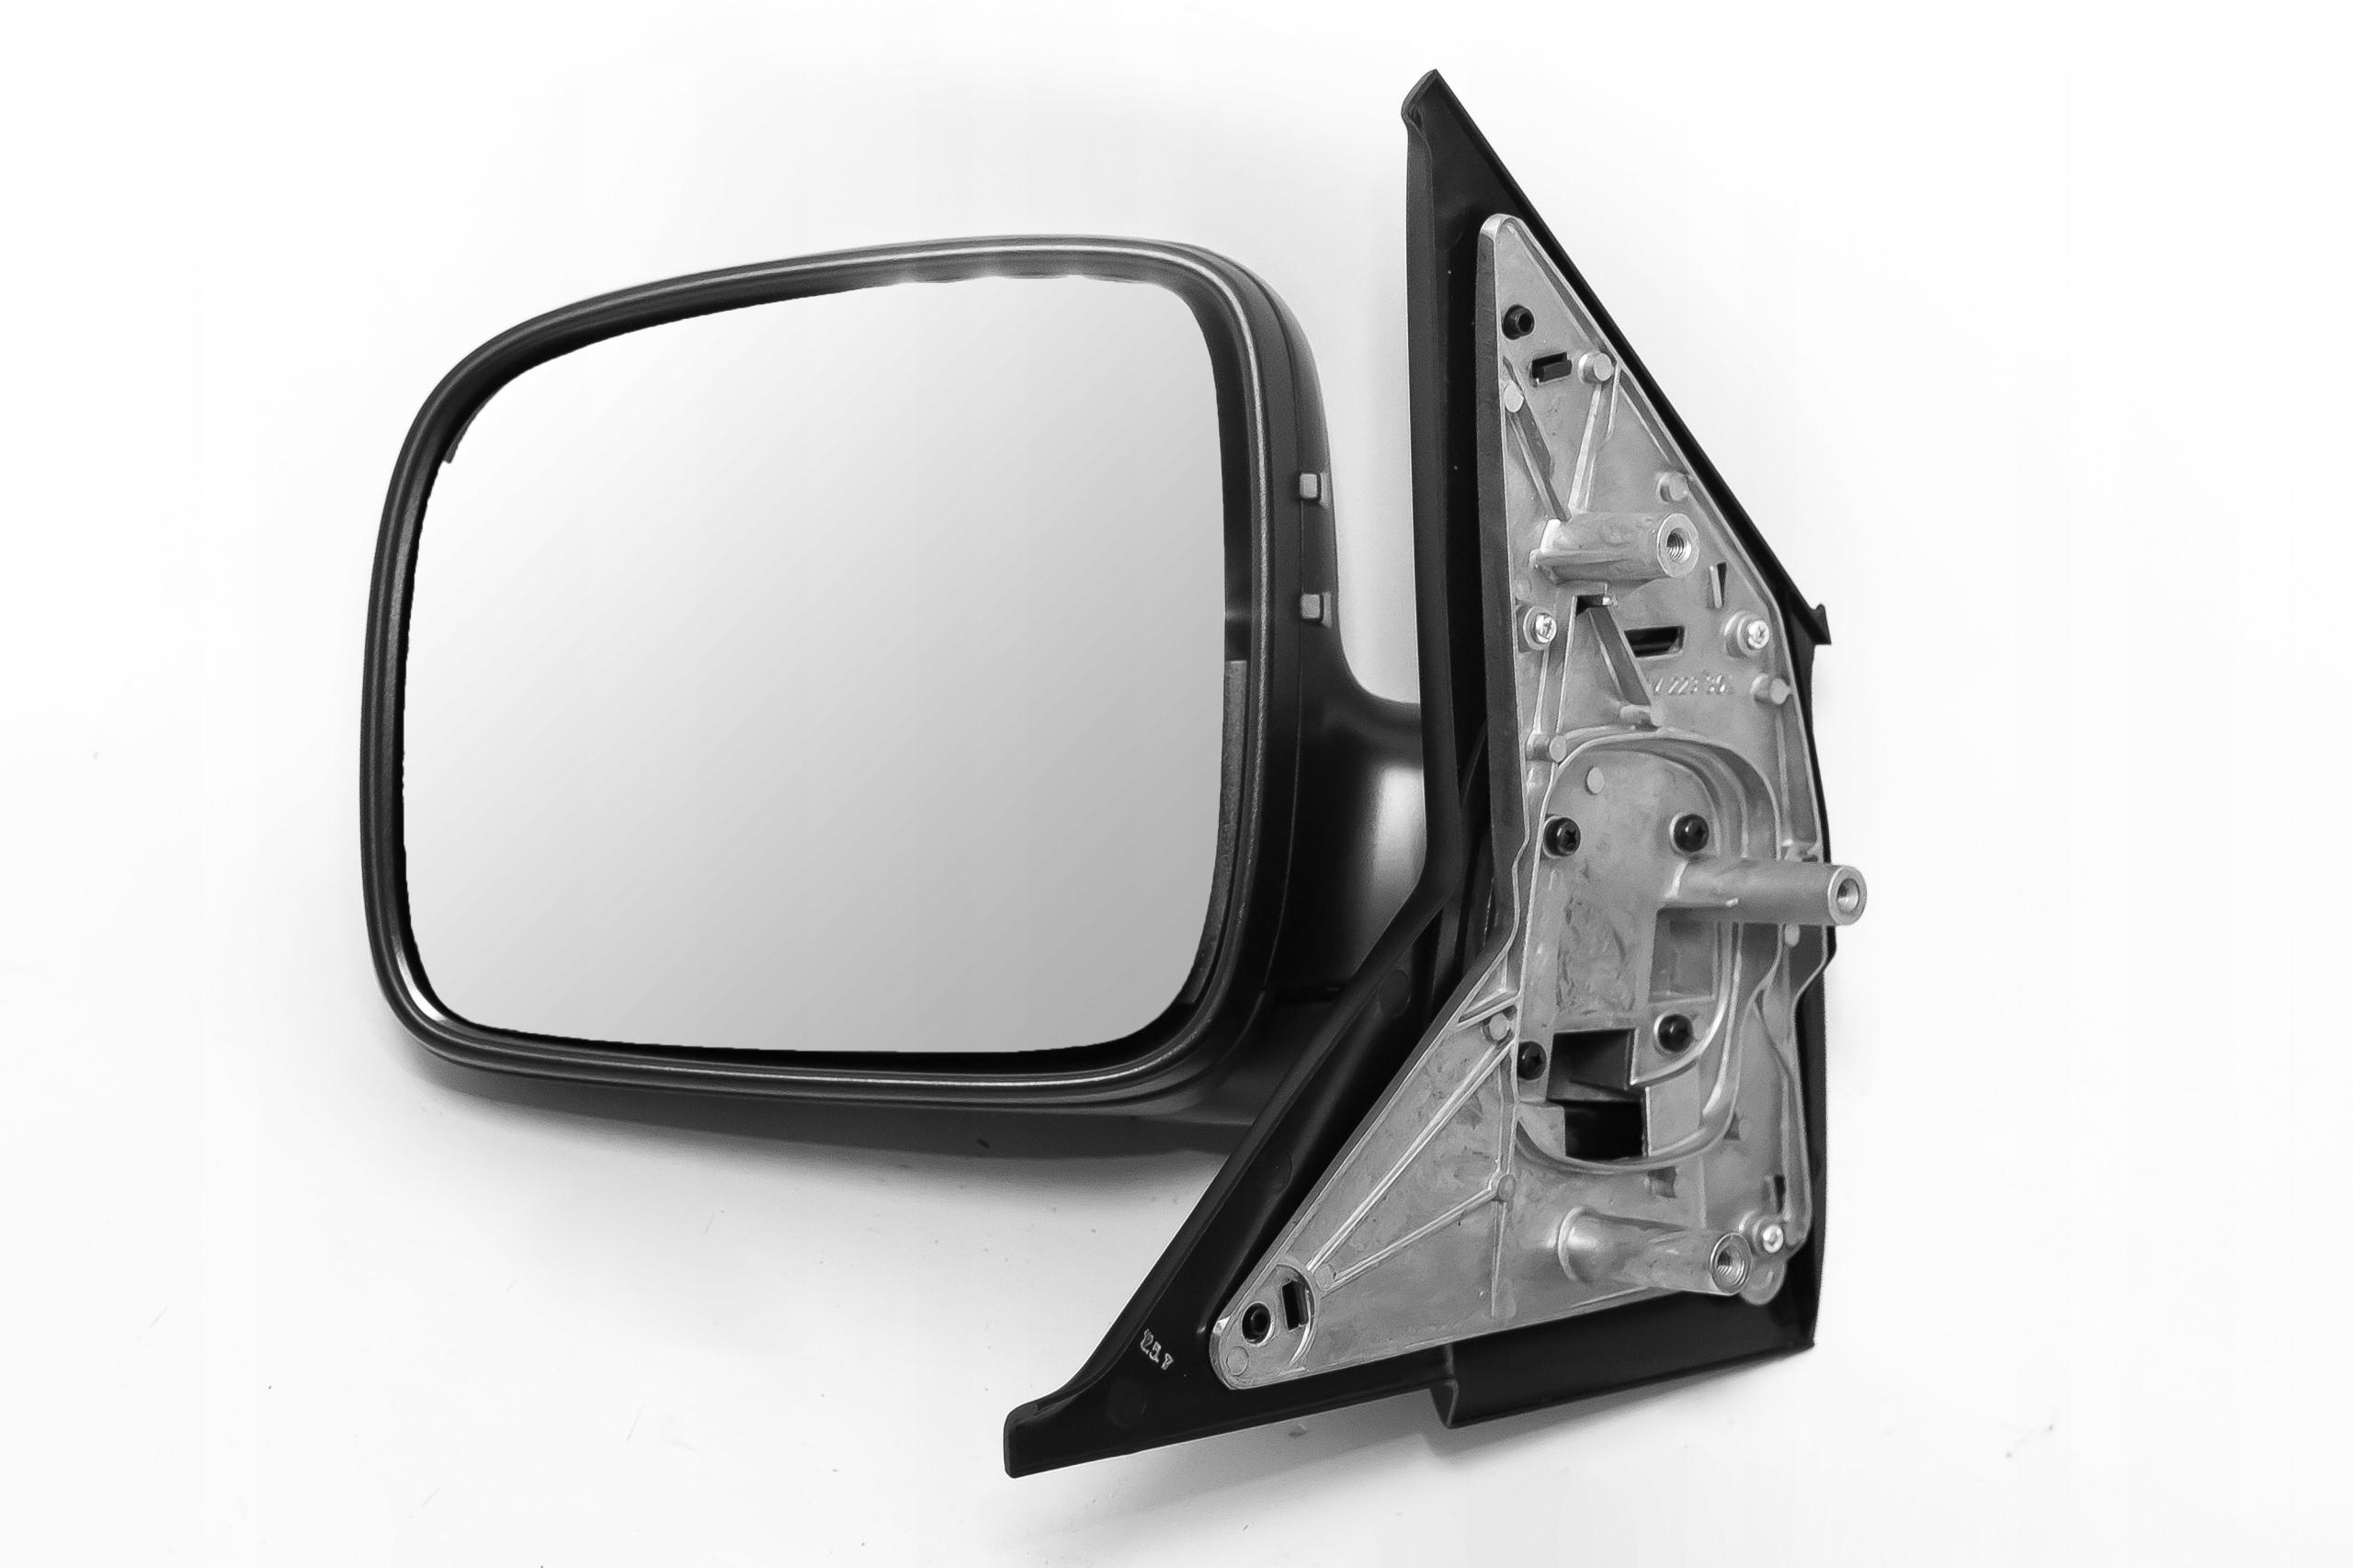 зеркало левое vw транспортер t5 03-09 ручные